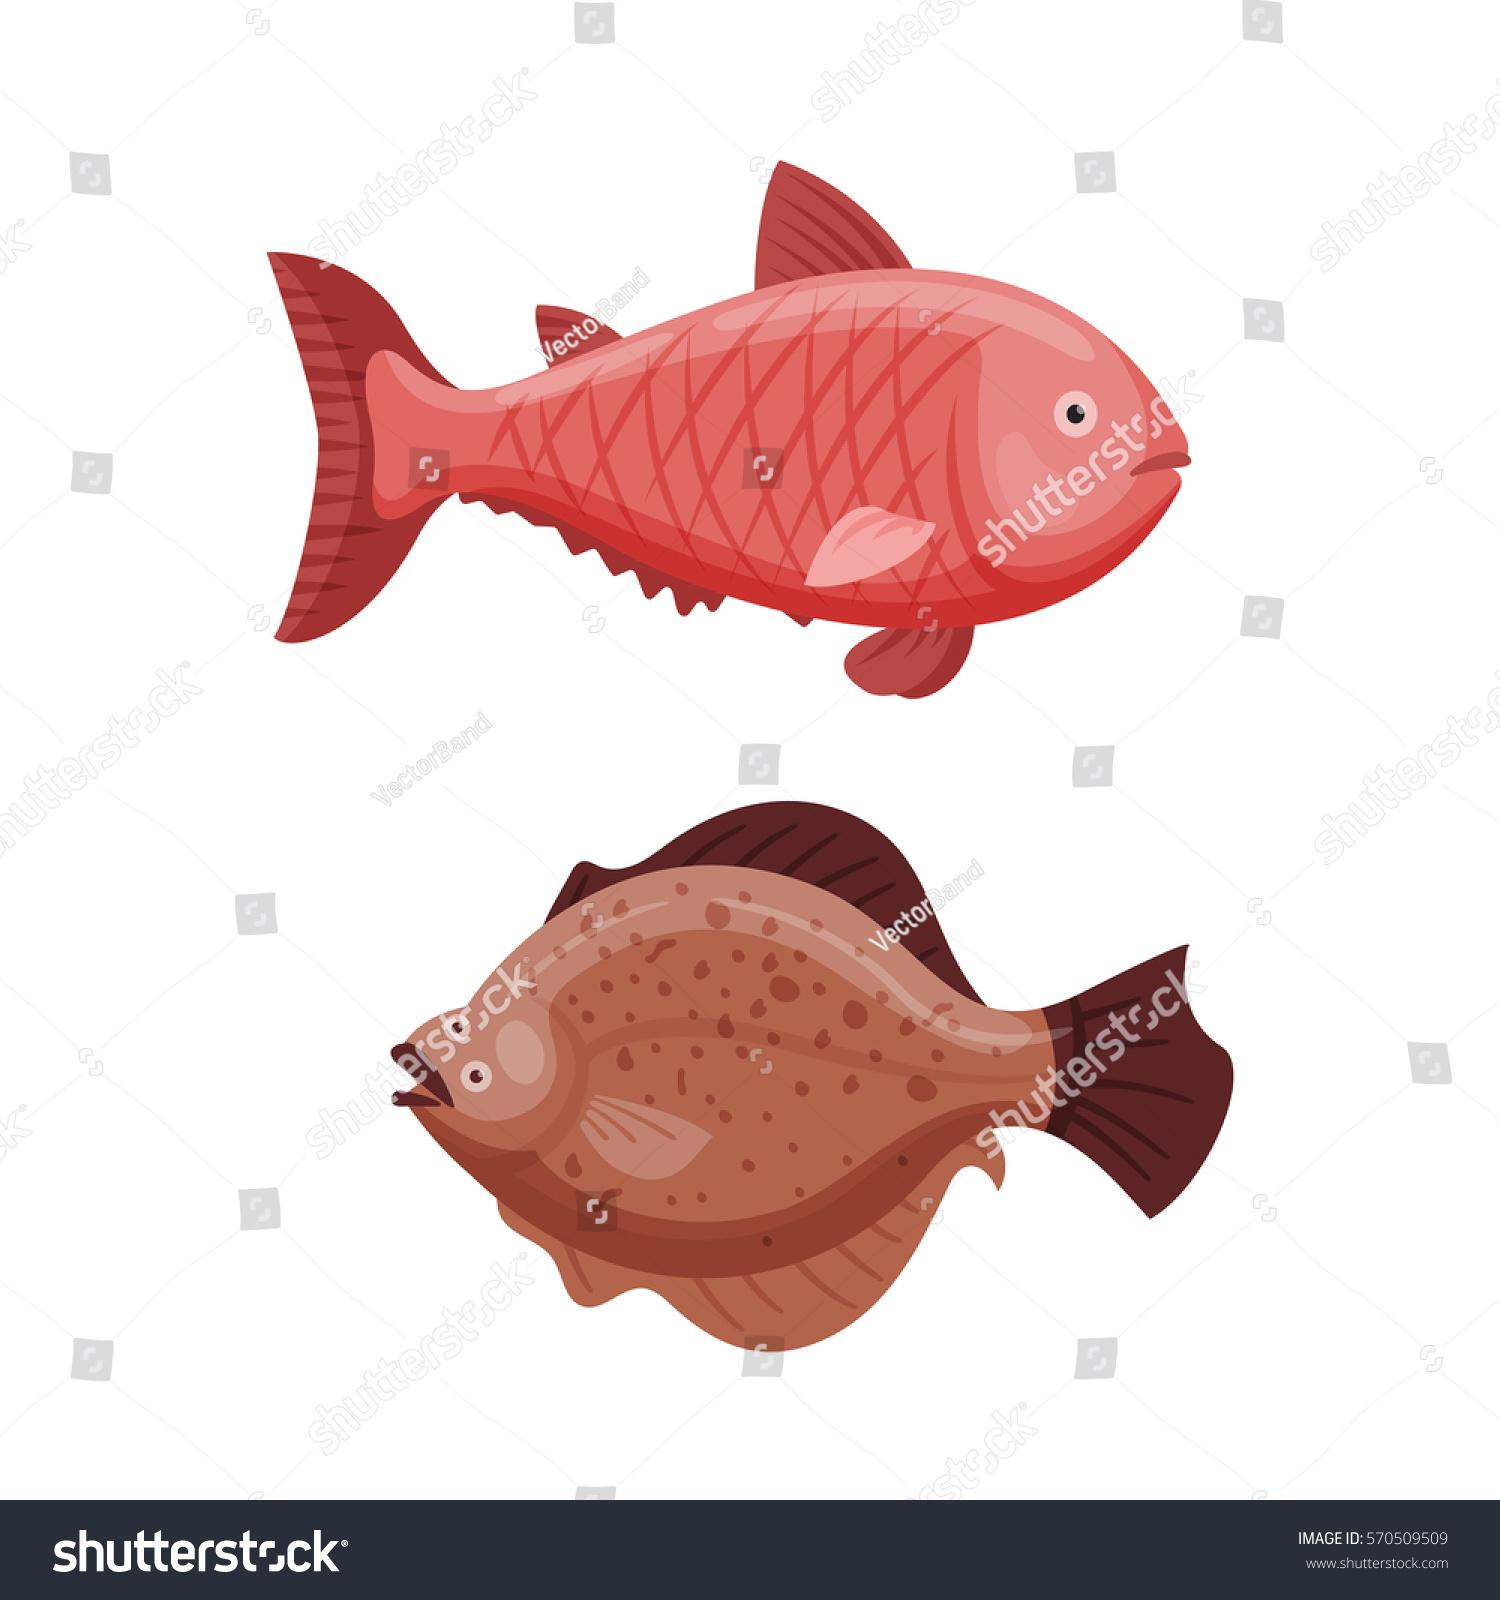 Grouper Cod Fish Vector Illustration Stock Vector 570509509 ...